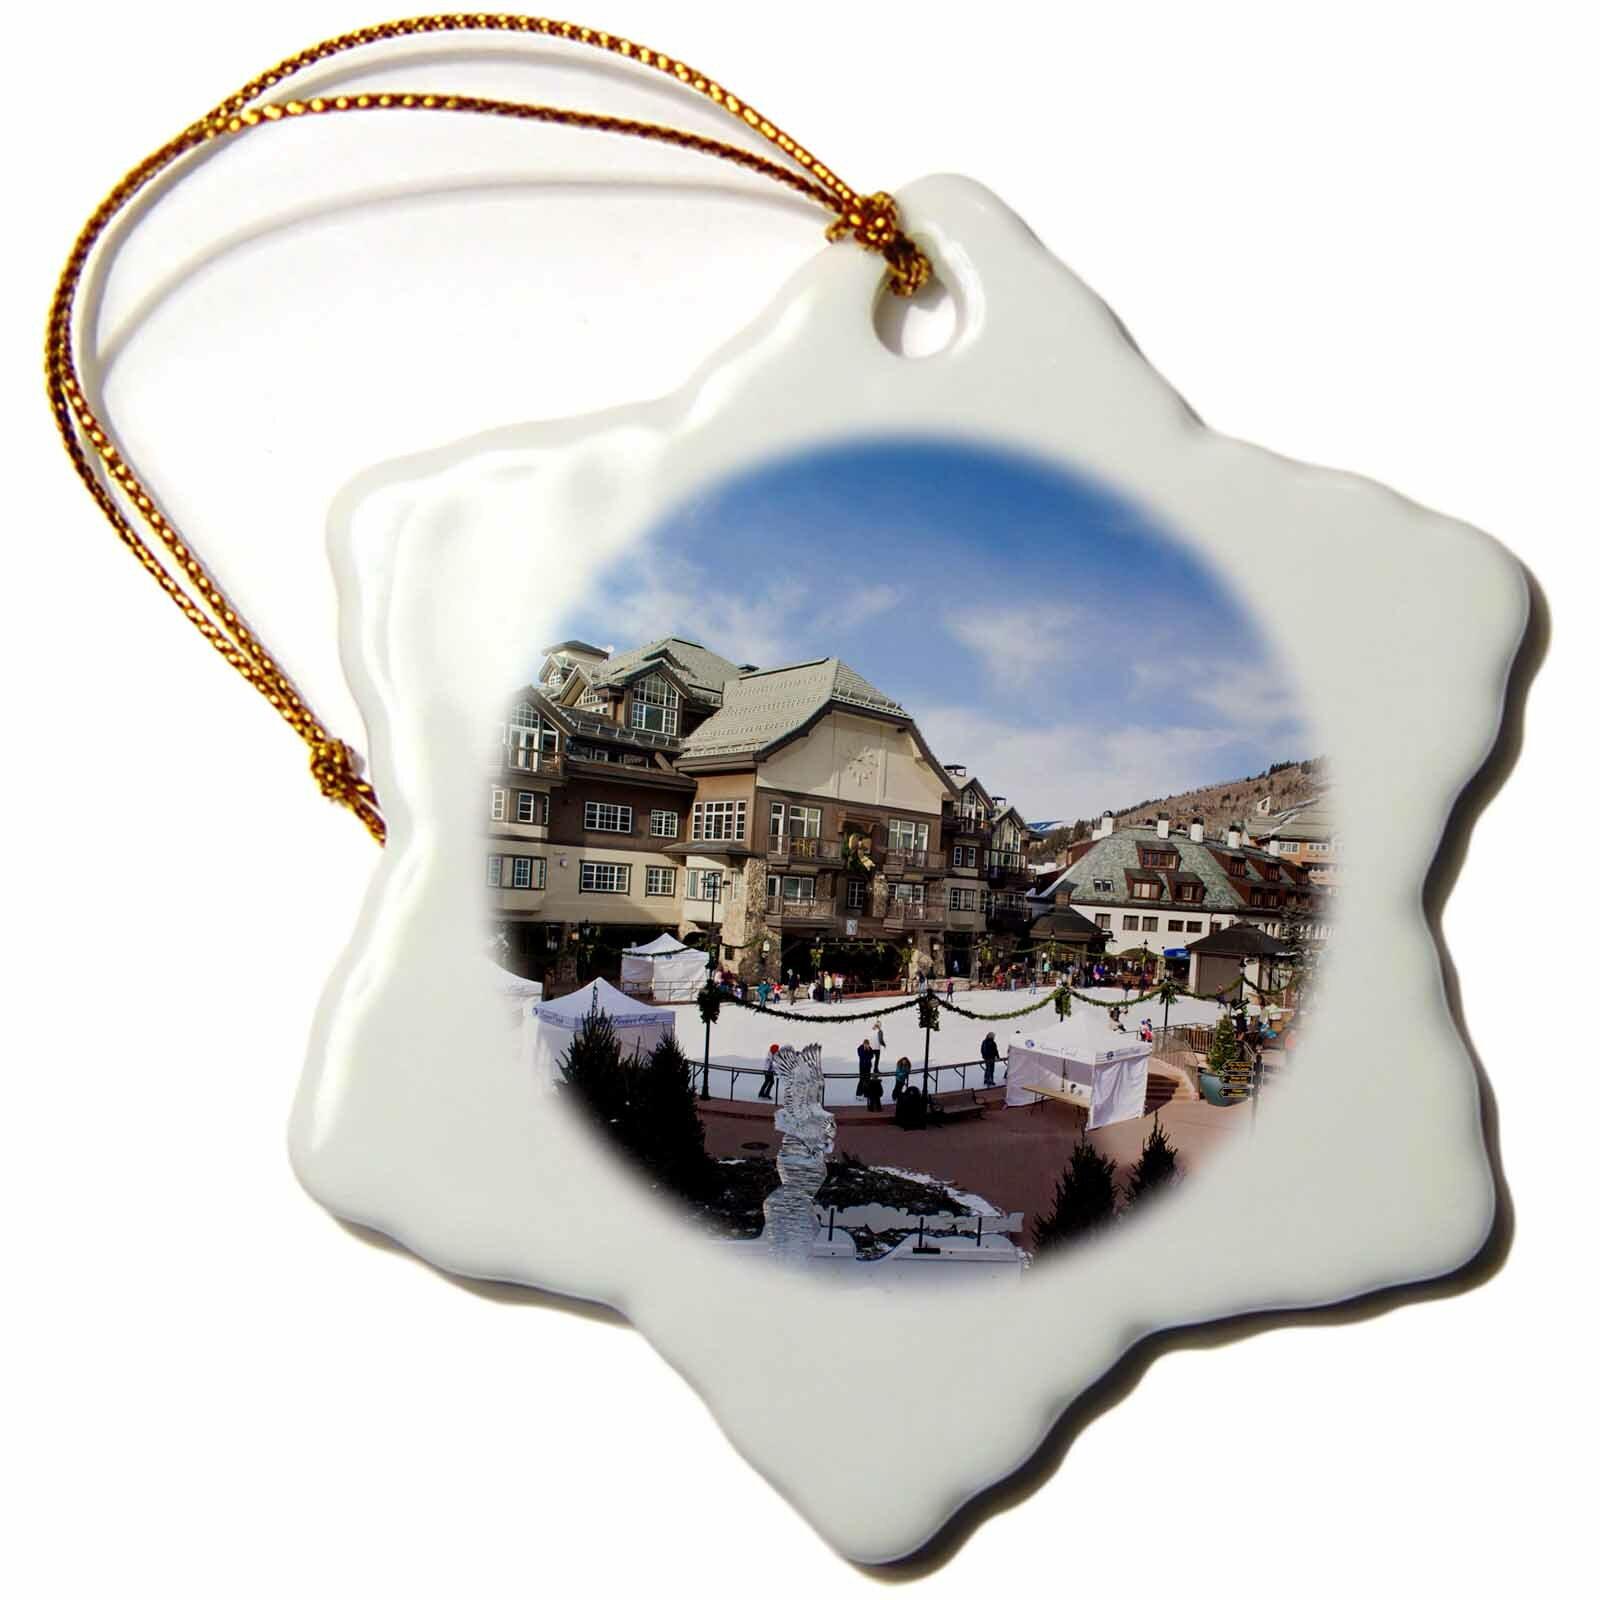 The Holiday Aisle Usa Colorado Beaver Creek Ski Resort Ice Rink Snowflake Holiday Shaped Ornament Wayfair